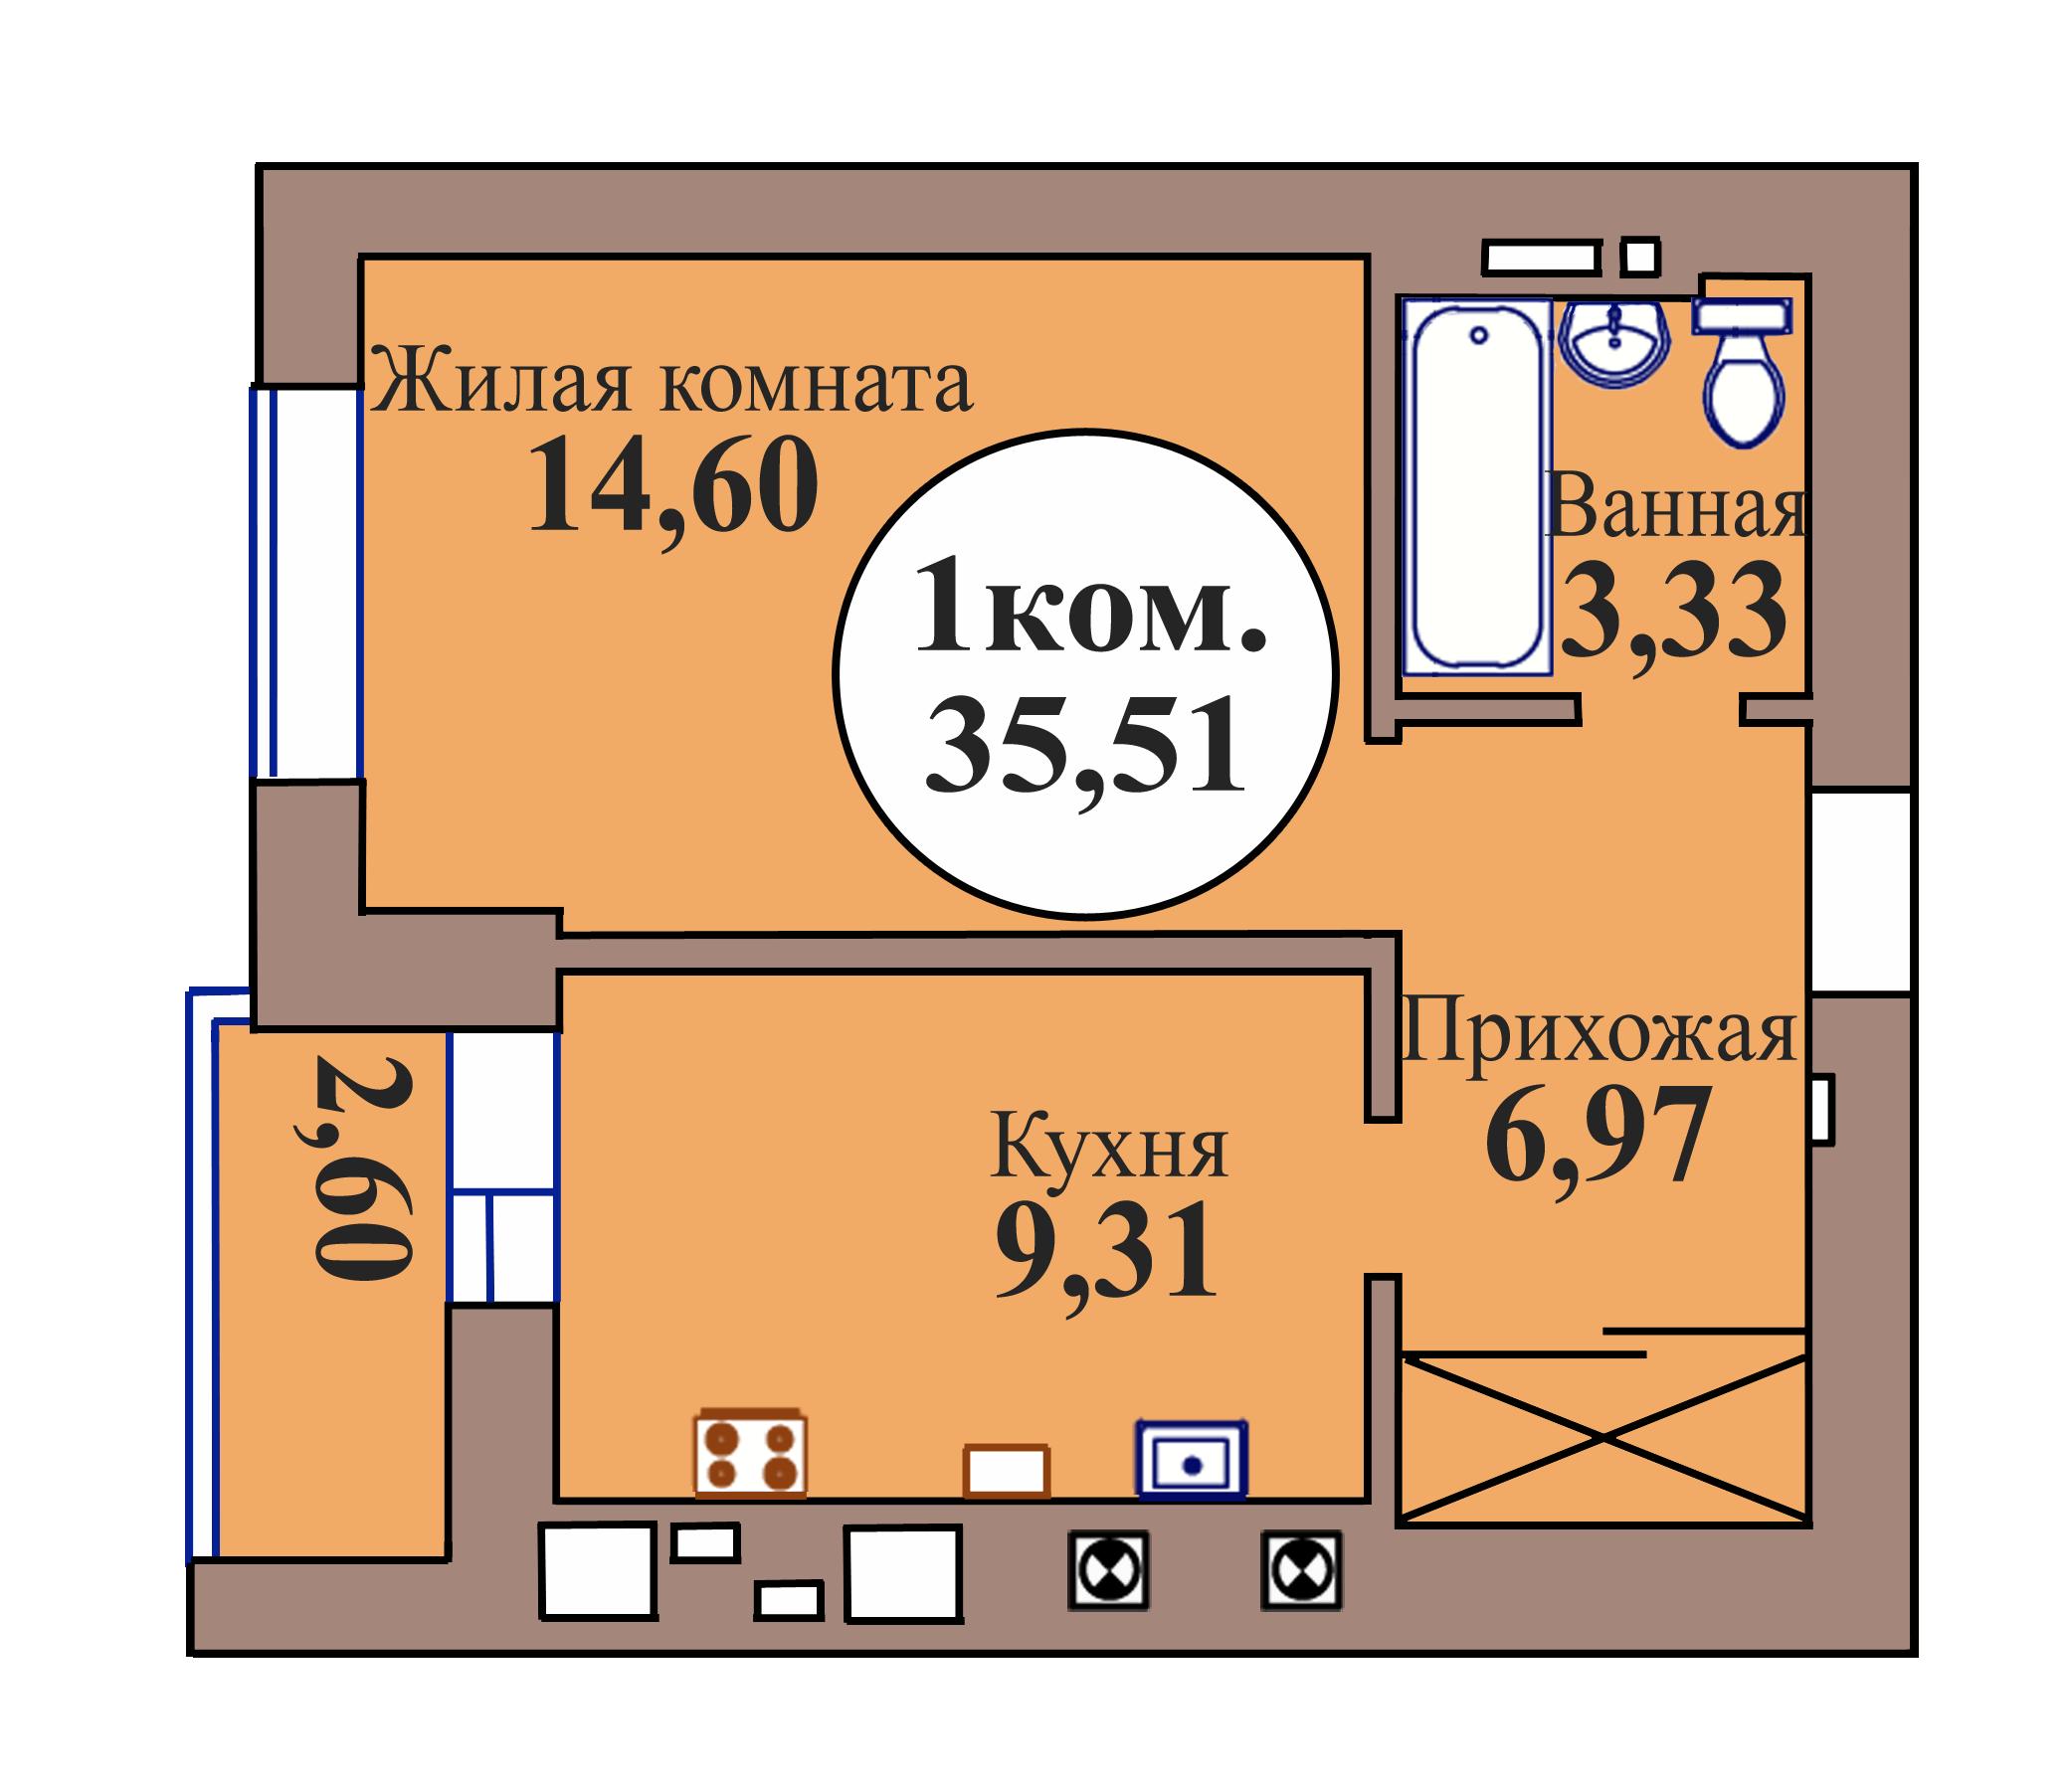 1-комн. кв. по ГП дом №3, МКР Васильково, кв. 13 в Калининграде